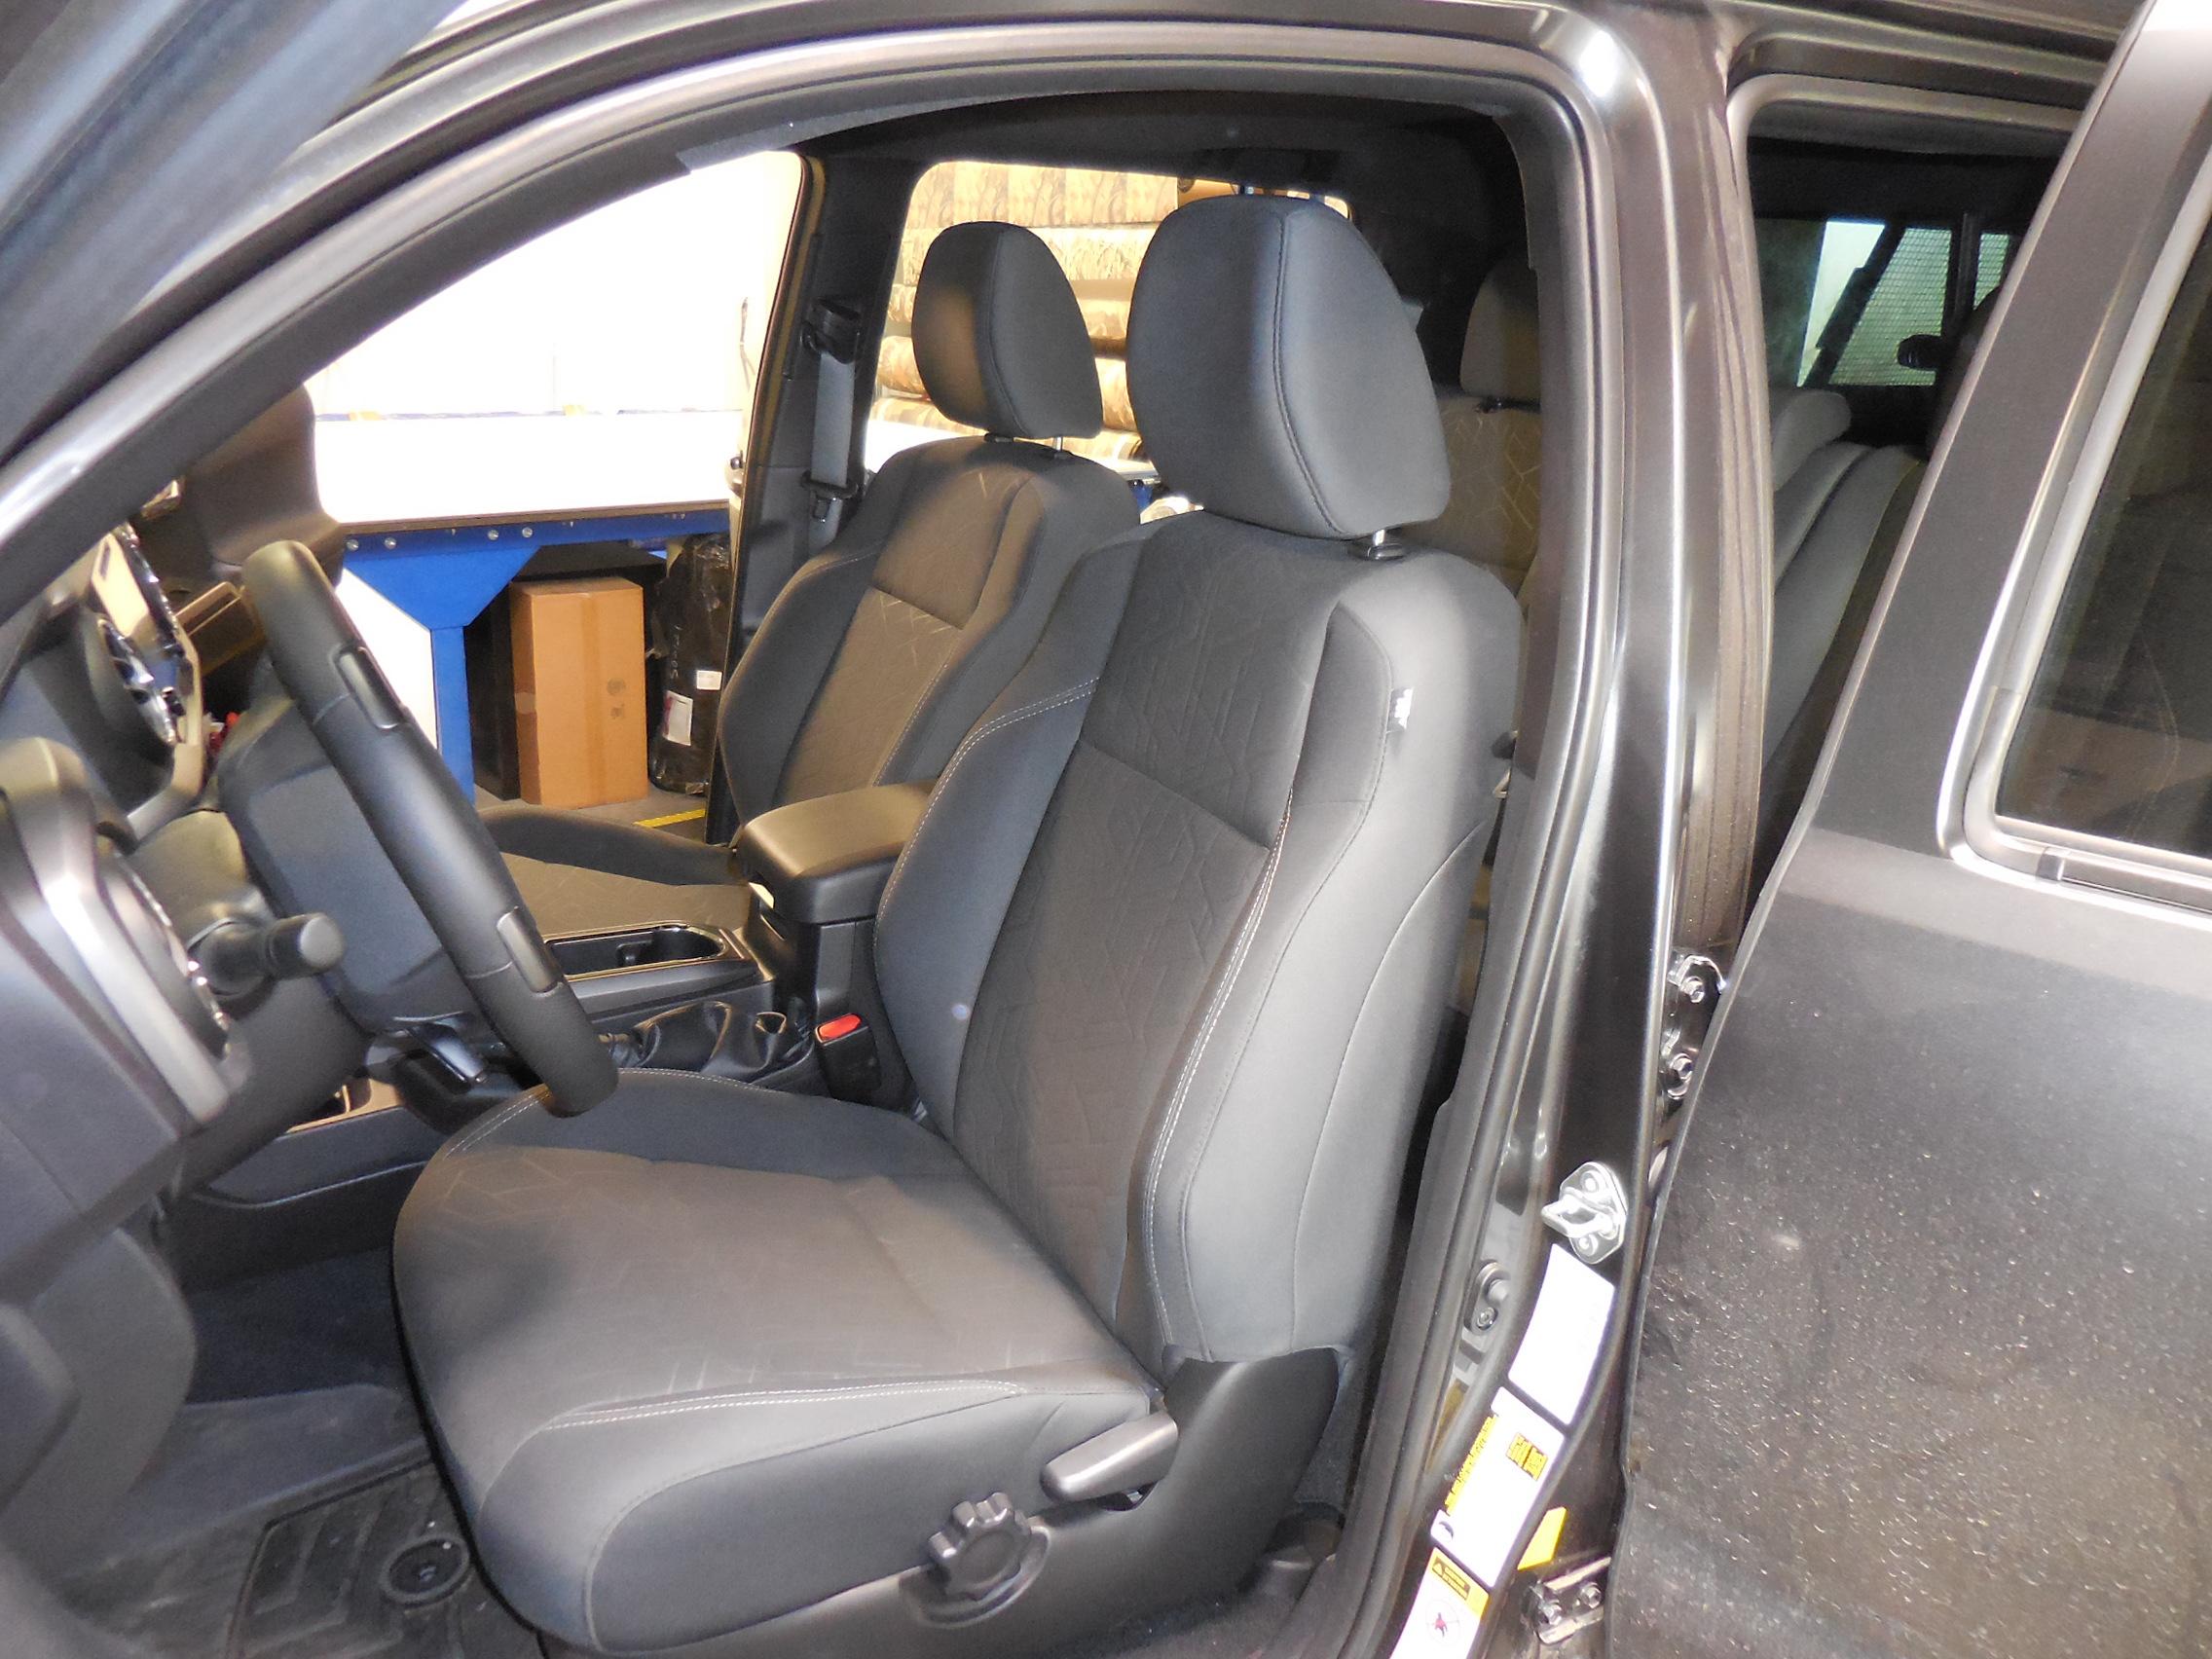 Tacoma Seat Covers >> 2016 2019 Tacoma Buckets Seat Covers